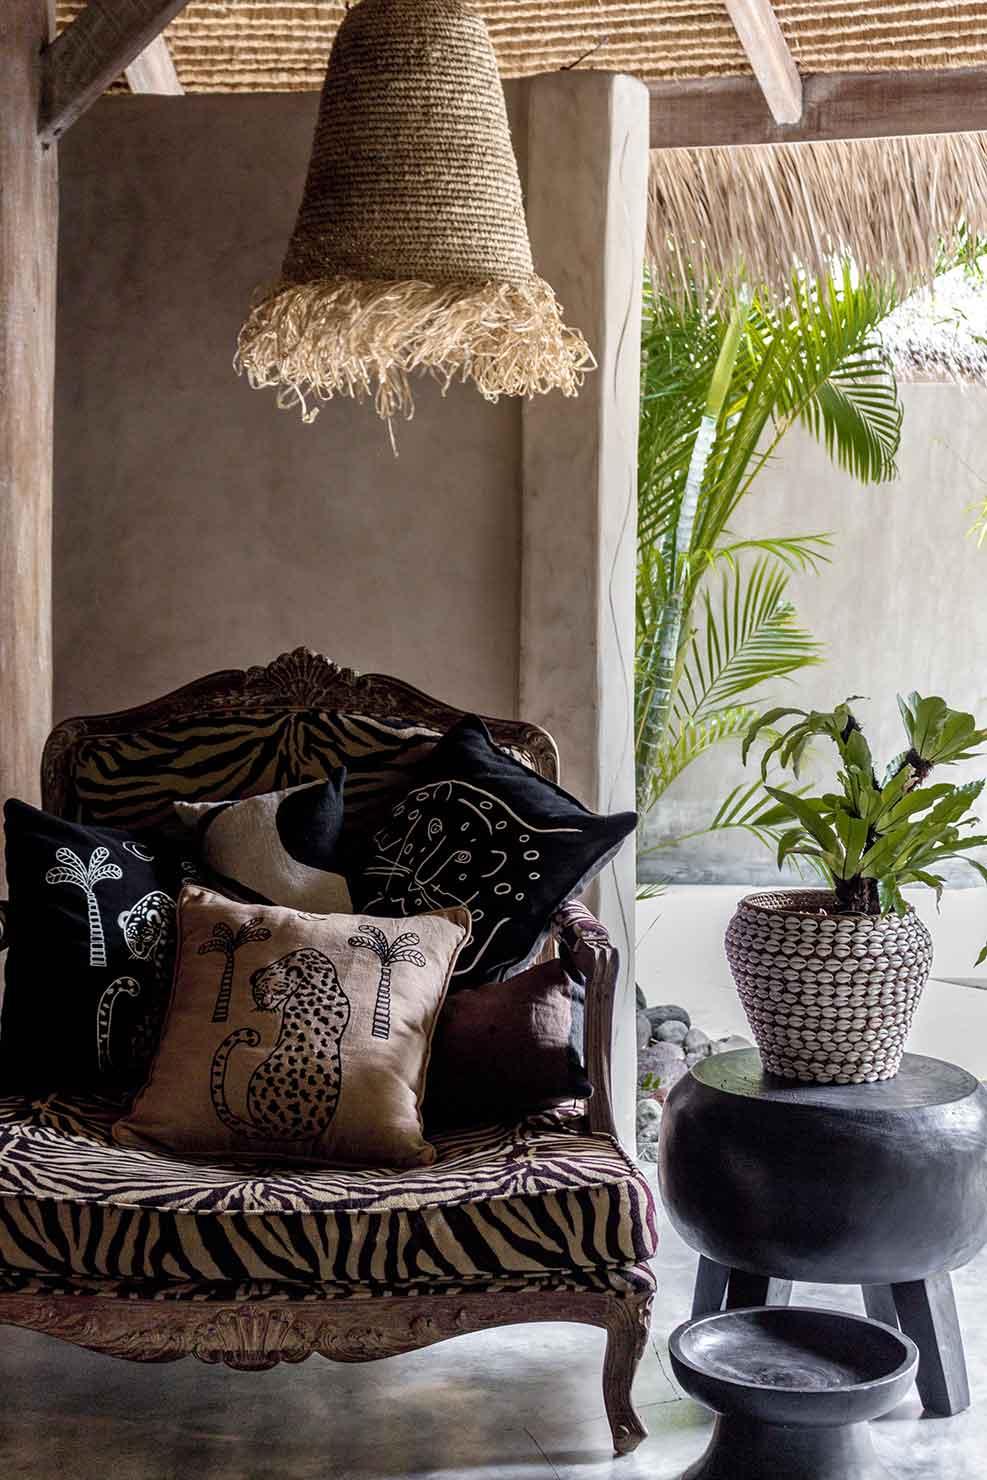 the jungle trader - Bali interiors